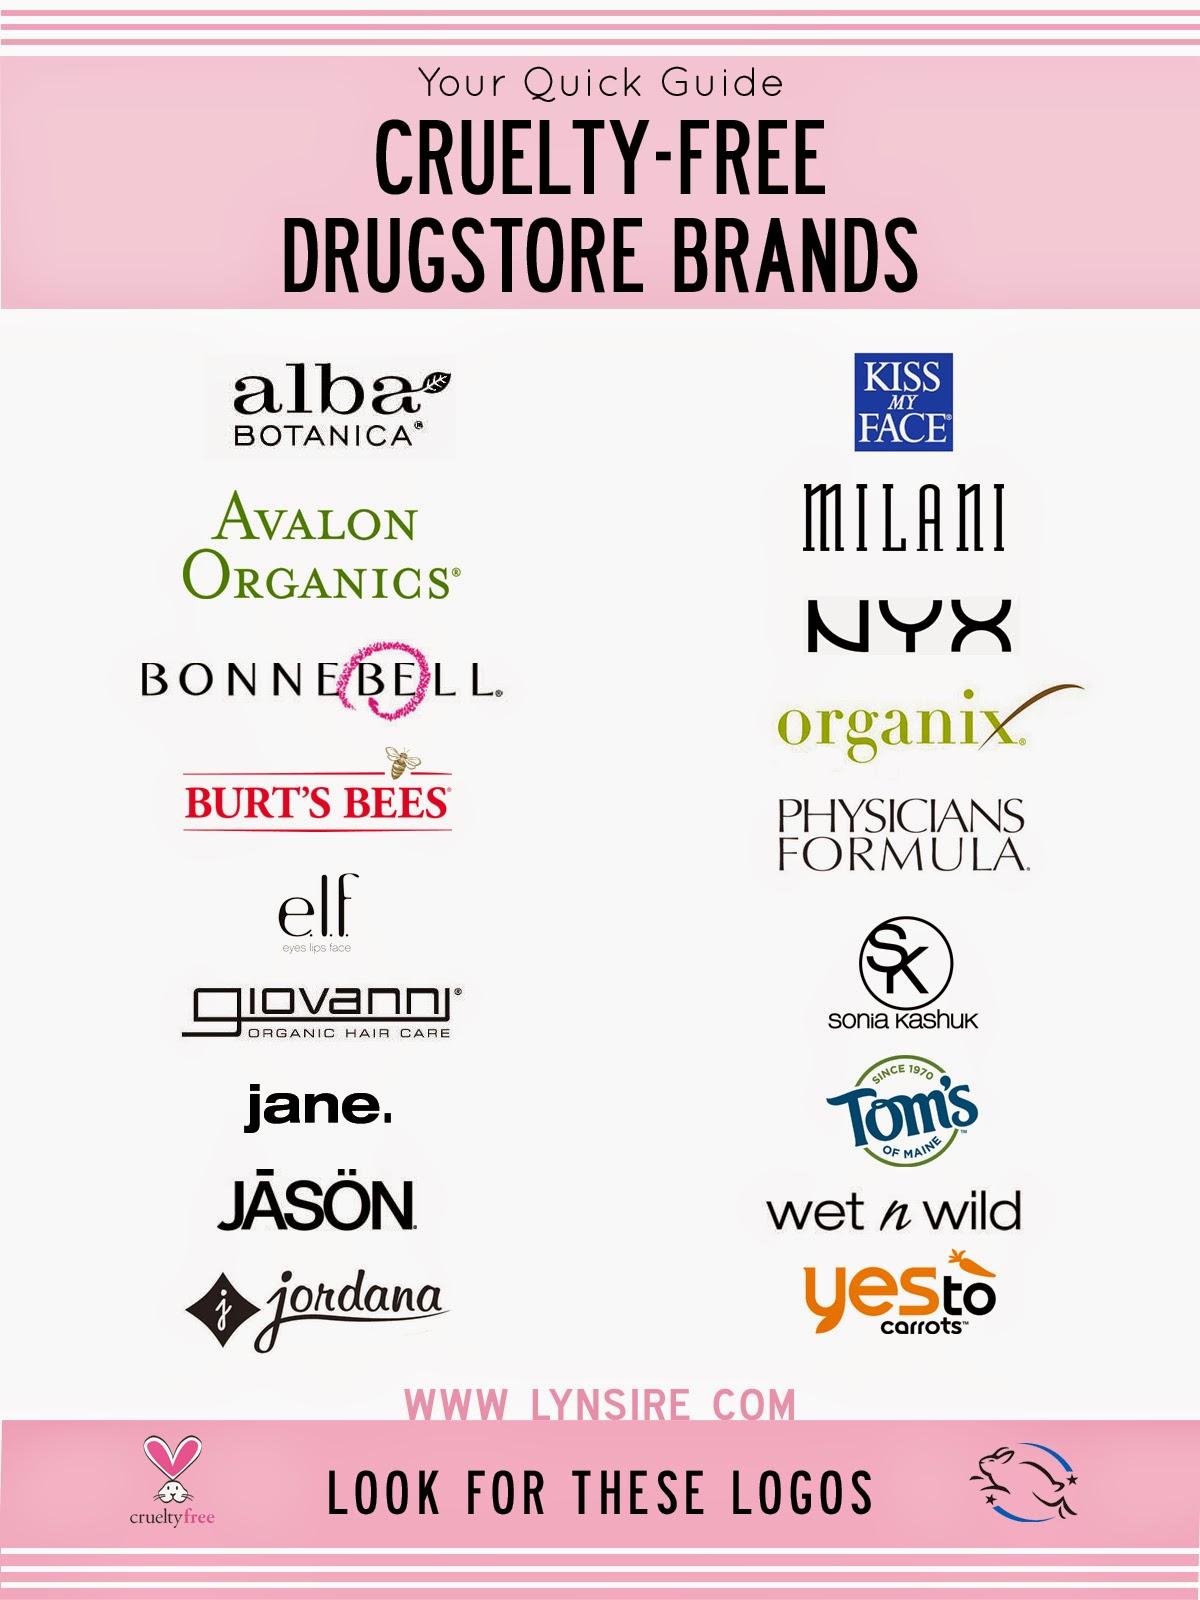 Cruelty-Free Drugstore Beauty Brands : LynSire: Cruelty-Free Life